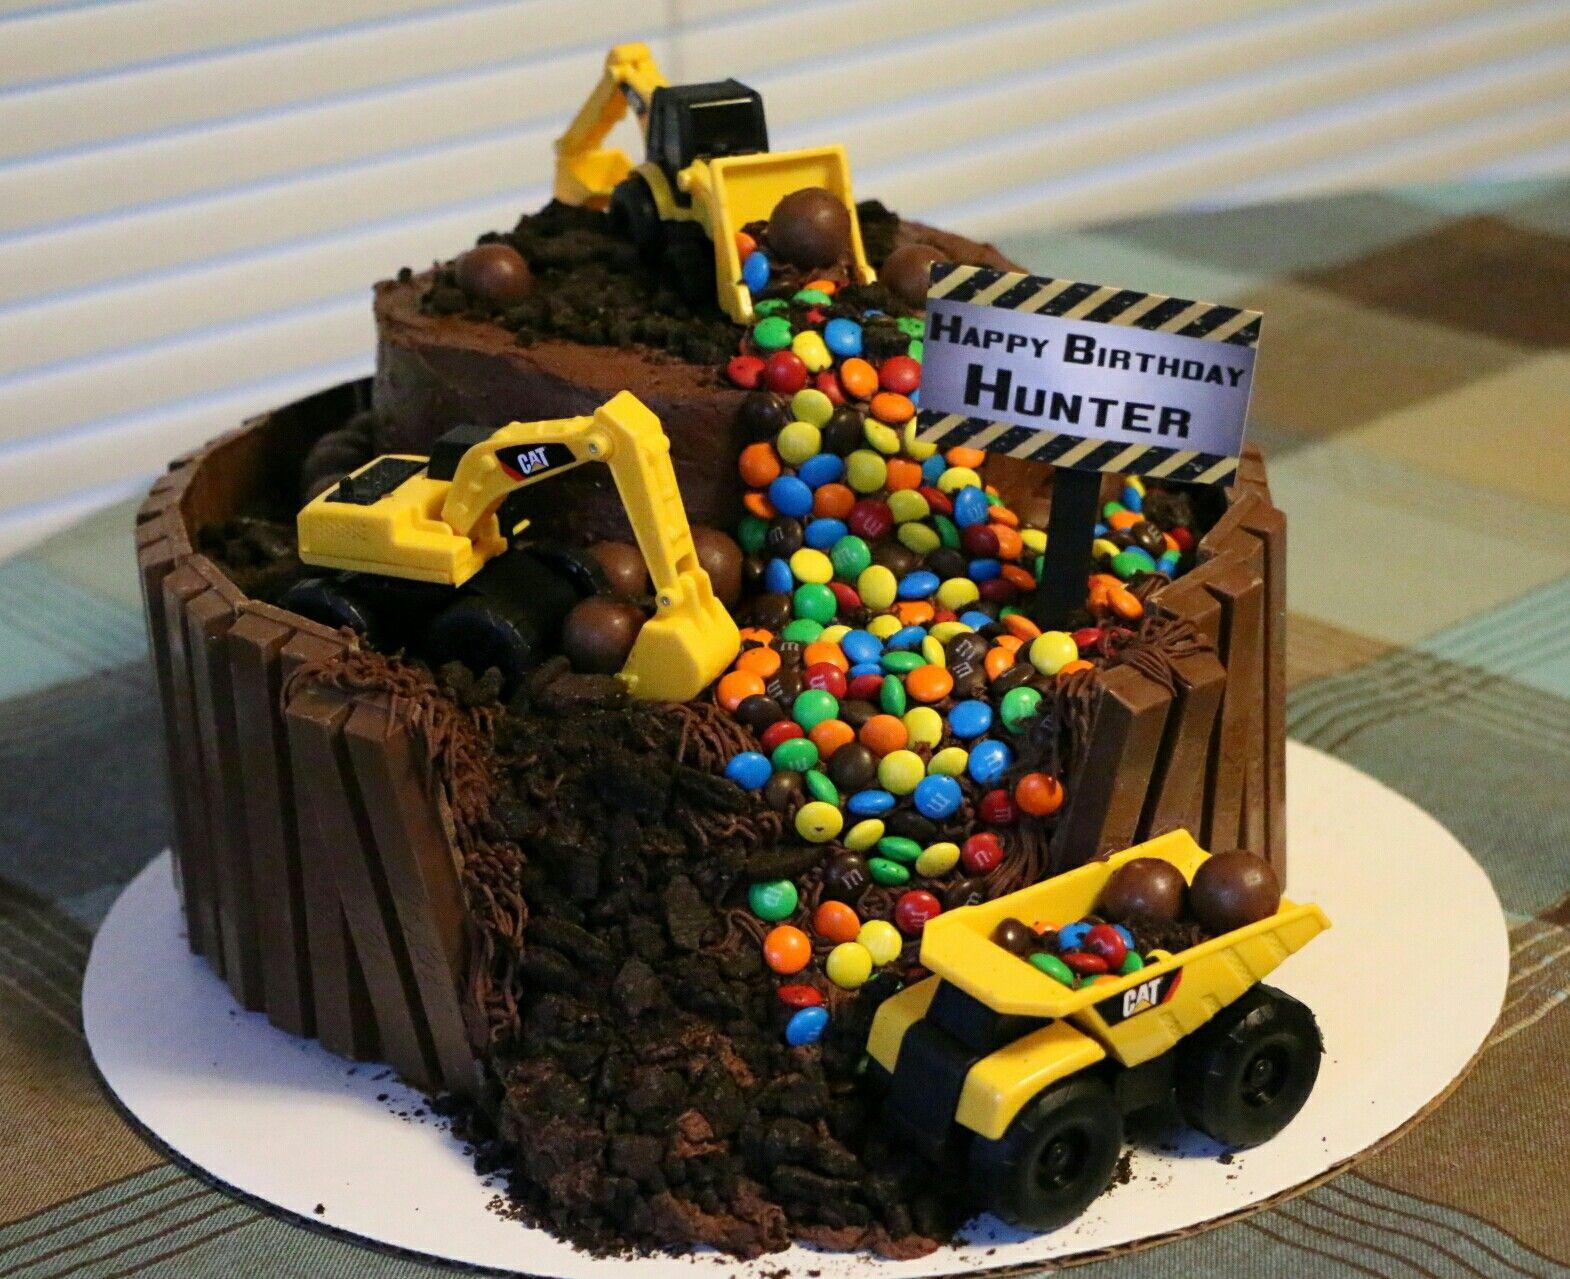 Construction theme trucks loaders bull dozers